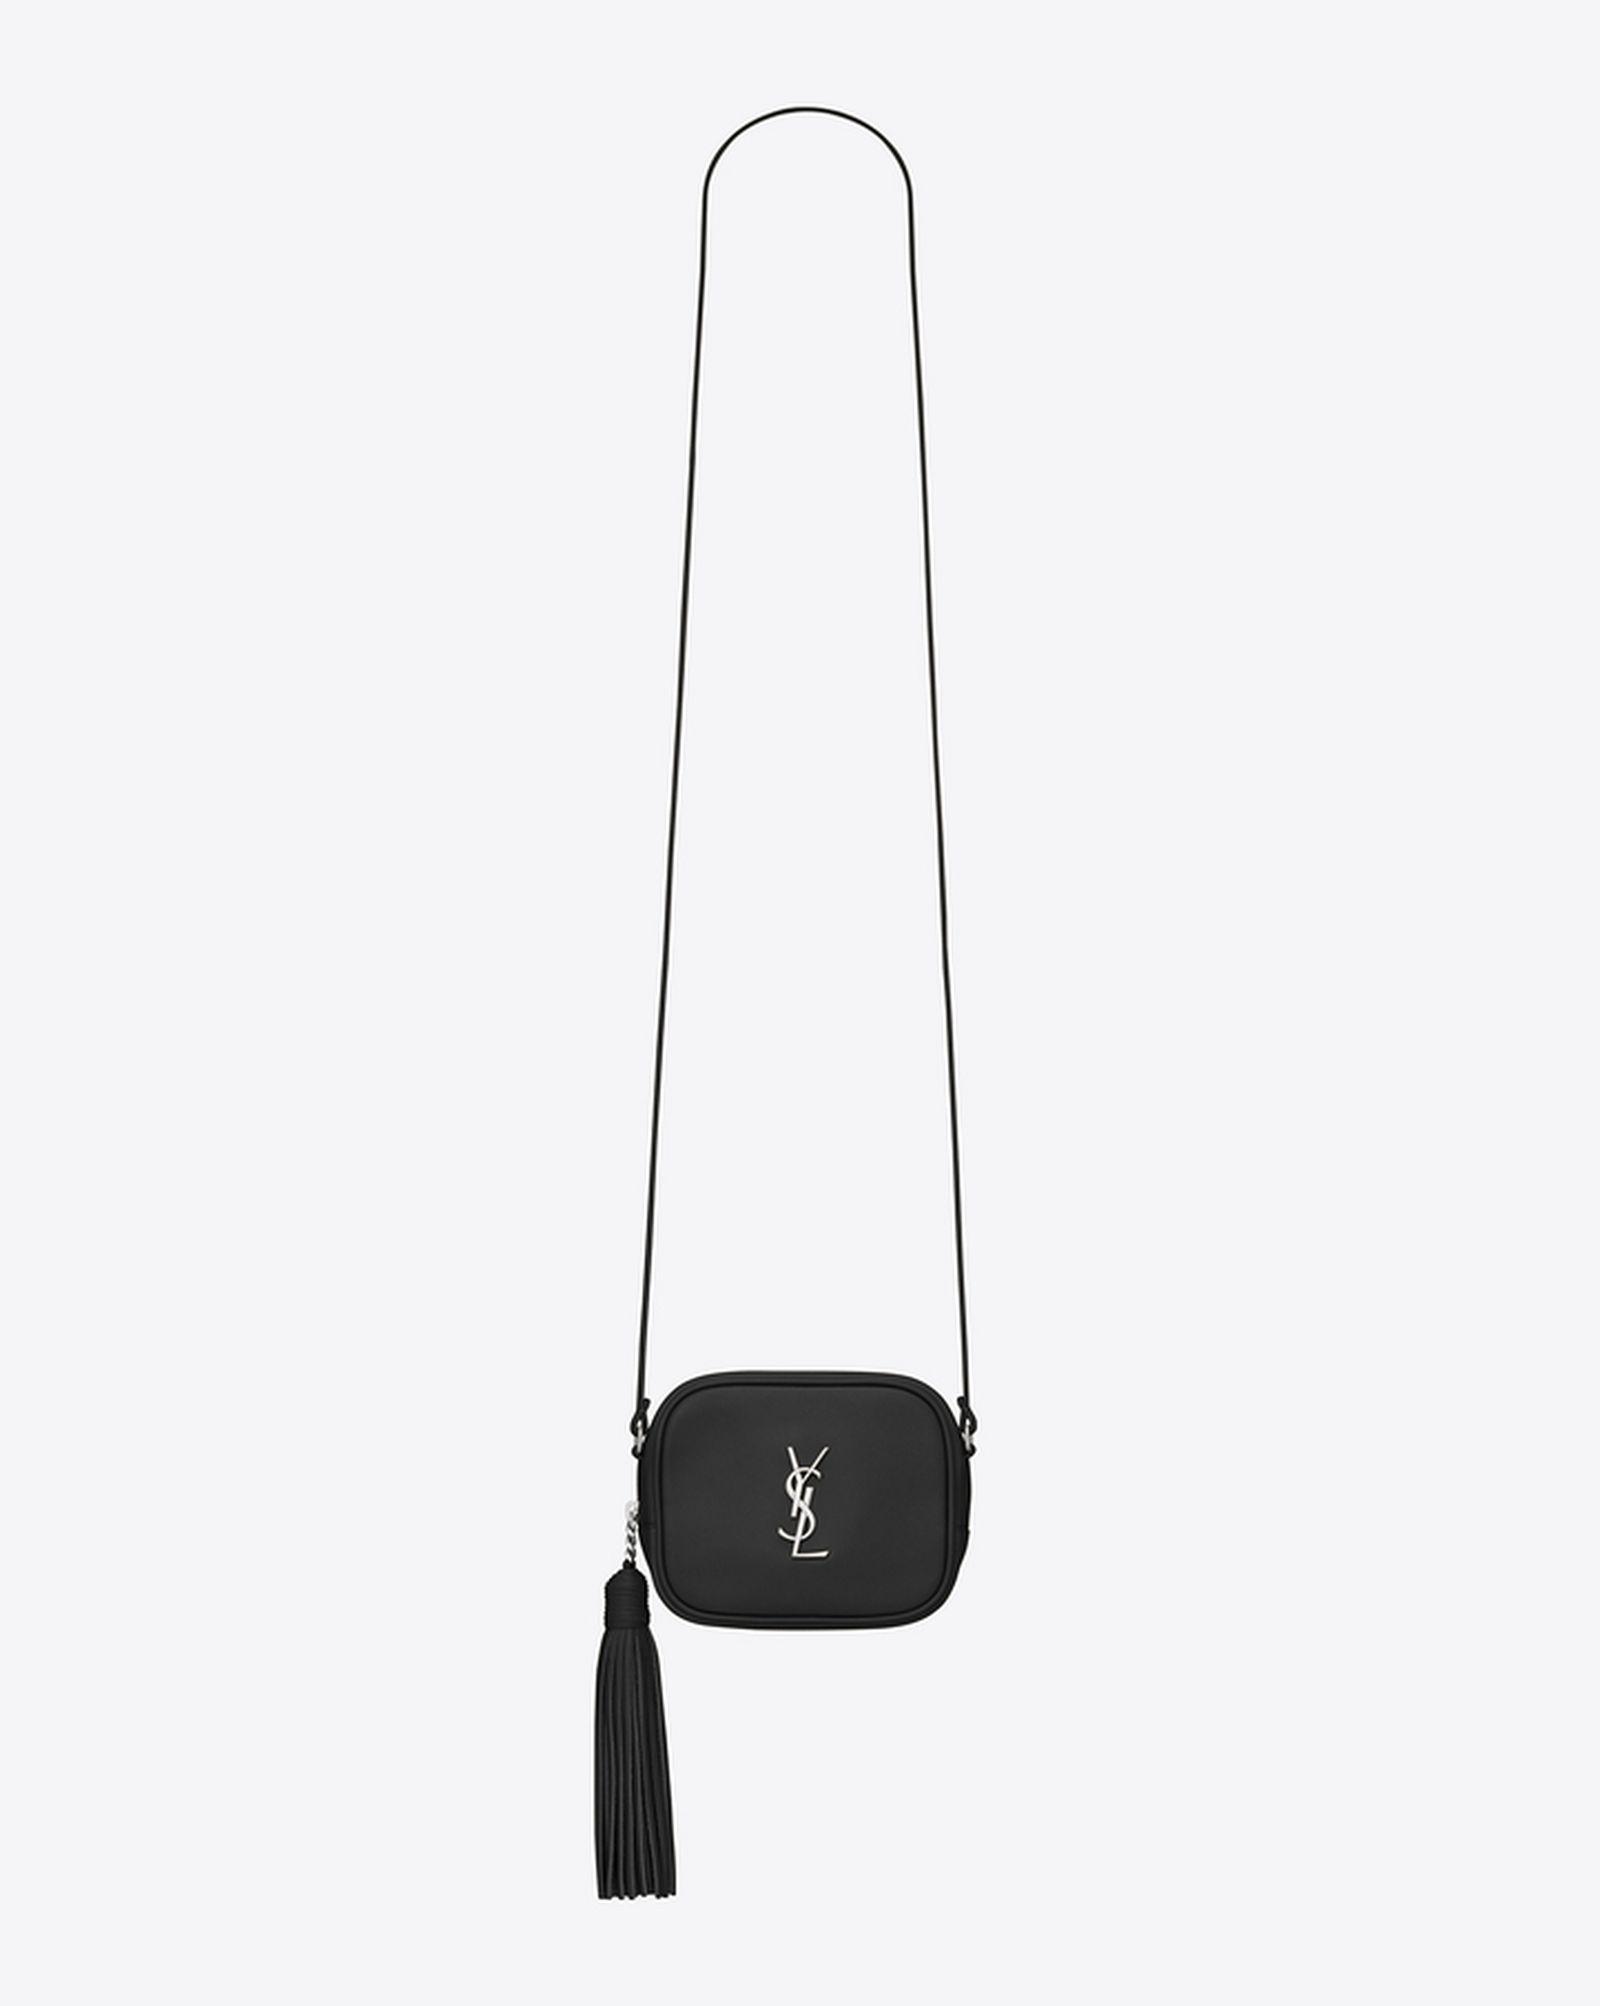 yvessaintlaurent handbags - One of Saint Laurent's Least Expensive Handbags Is Called the ...